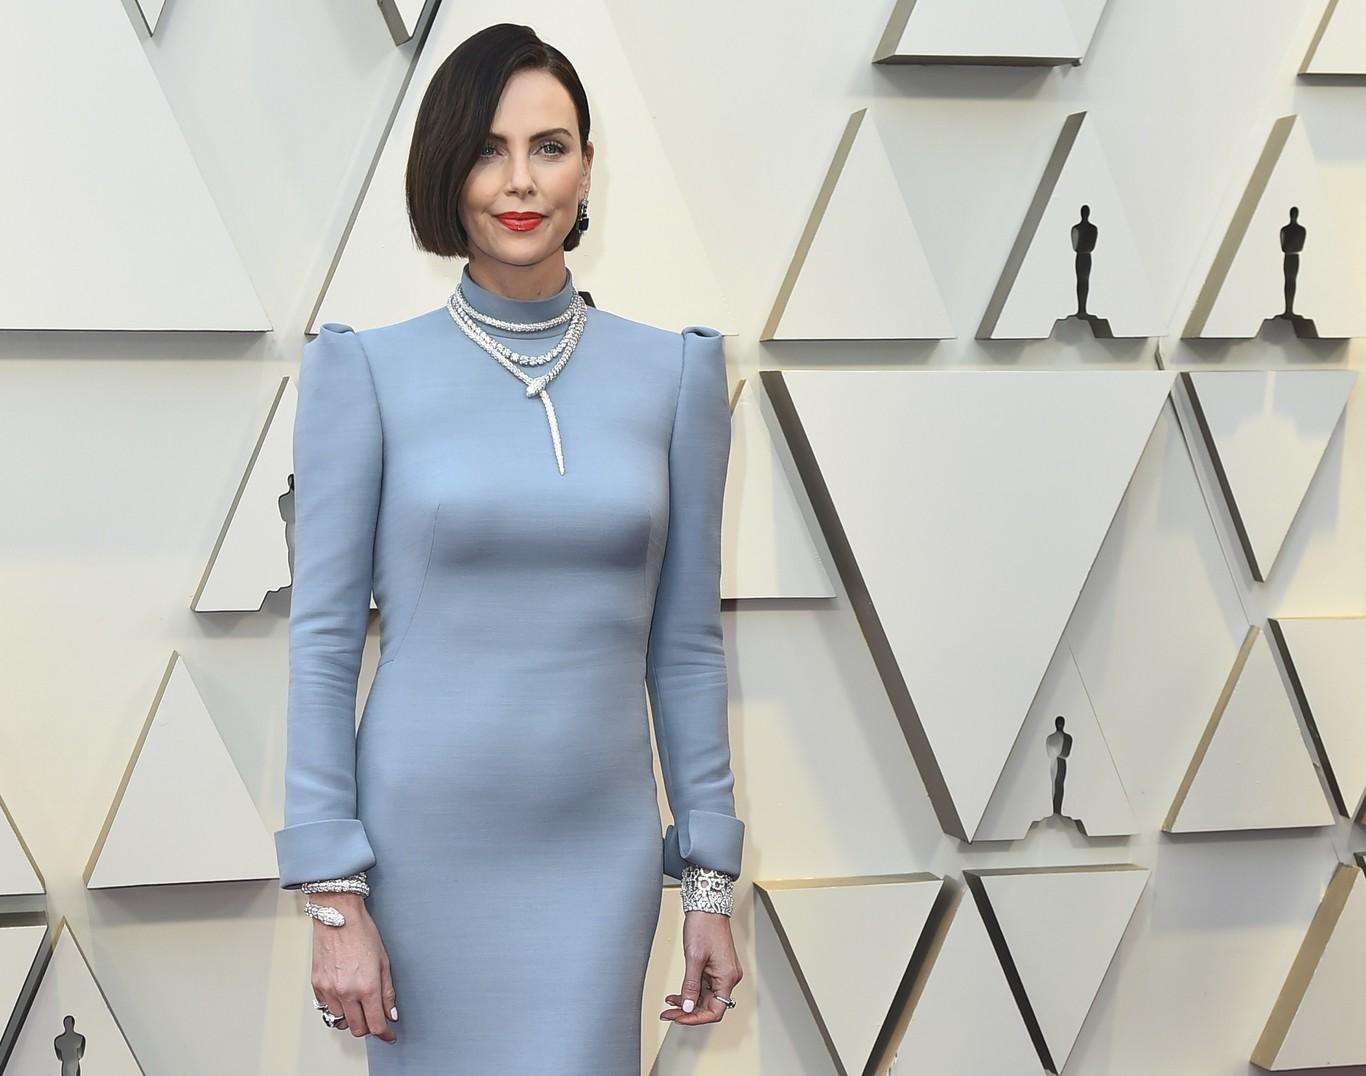 a3fe499cd Premios Oscar 2019  Charlize Theron se atreve con el azul cielo ...